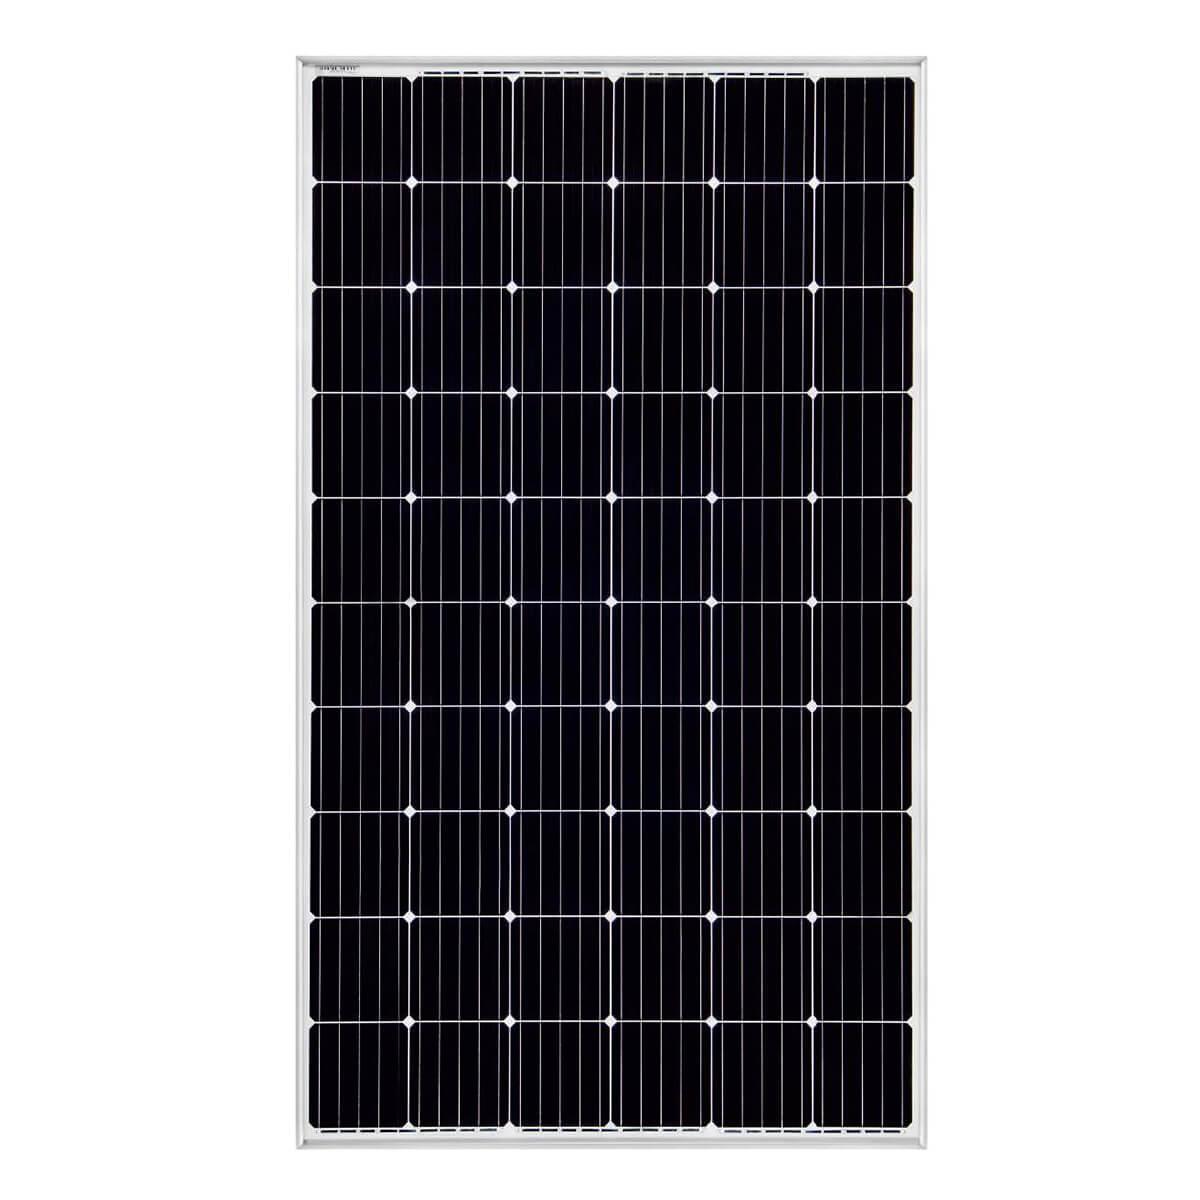 Odul solar 305W panel, odul solar 305Watt panel, Odul solar 305 W panel, odul solar 305 Watt panel, odul solar 305 Watt monokristal panel, Odul solar 305 W watt gunes paneli, odul solar 305 W watt monokristal gunes paneli, odul solar 305 W Watt fotovoltaik monokristal solar panel, odul solar 305W monokristal gunes enerjisi, odul solar OSM60-305W panel, ÖDÜL SOLAR 305 WATT